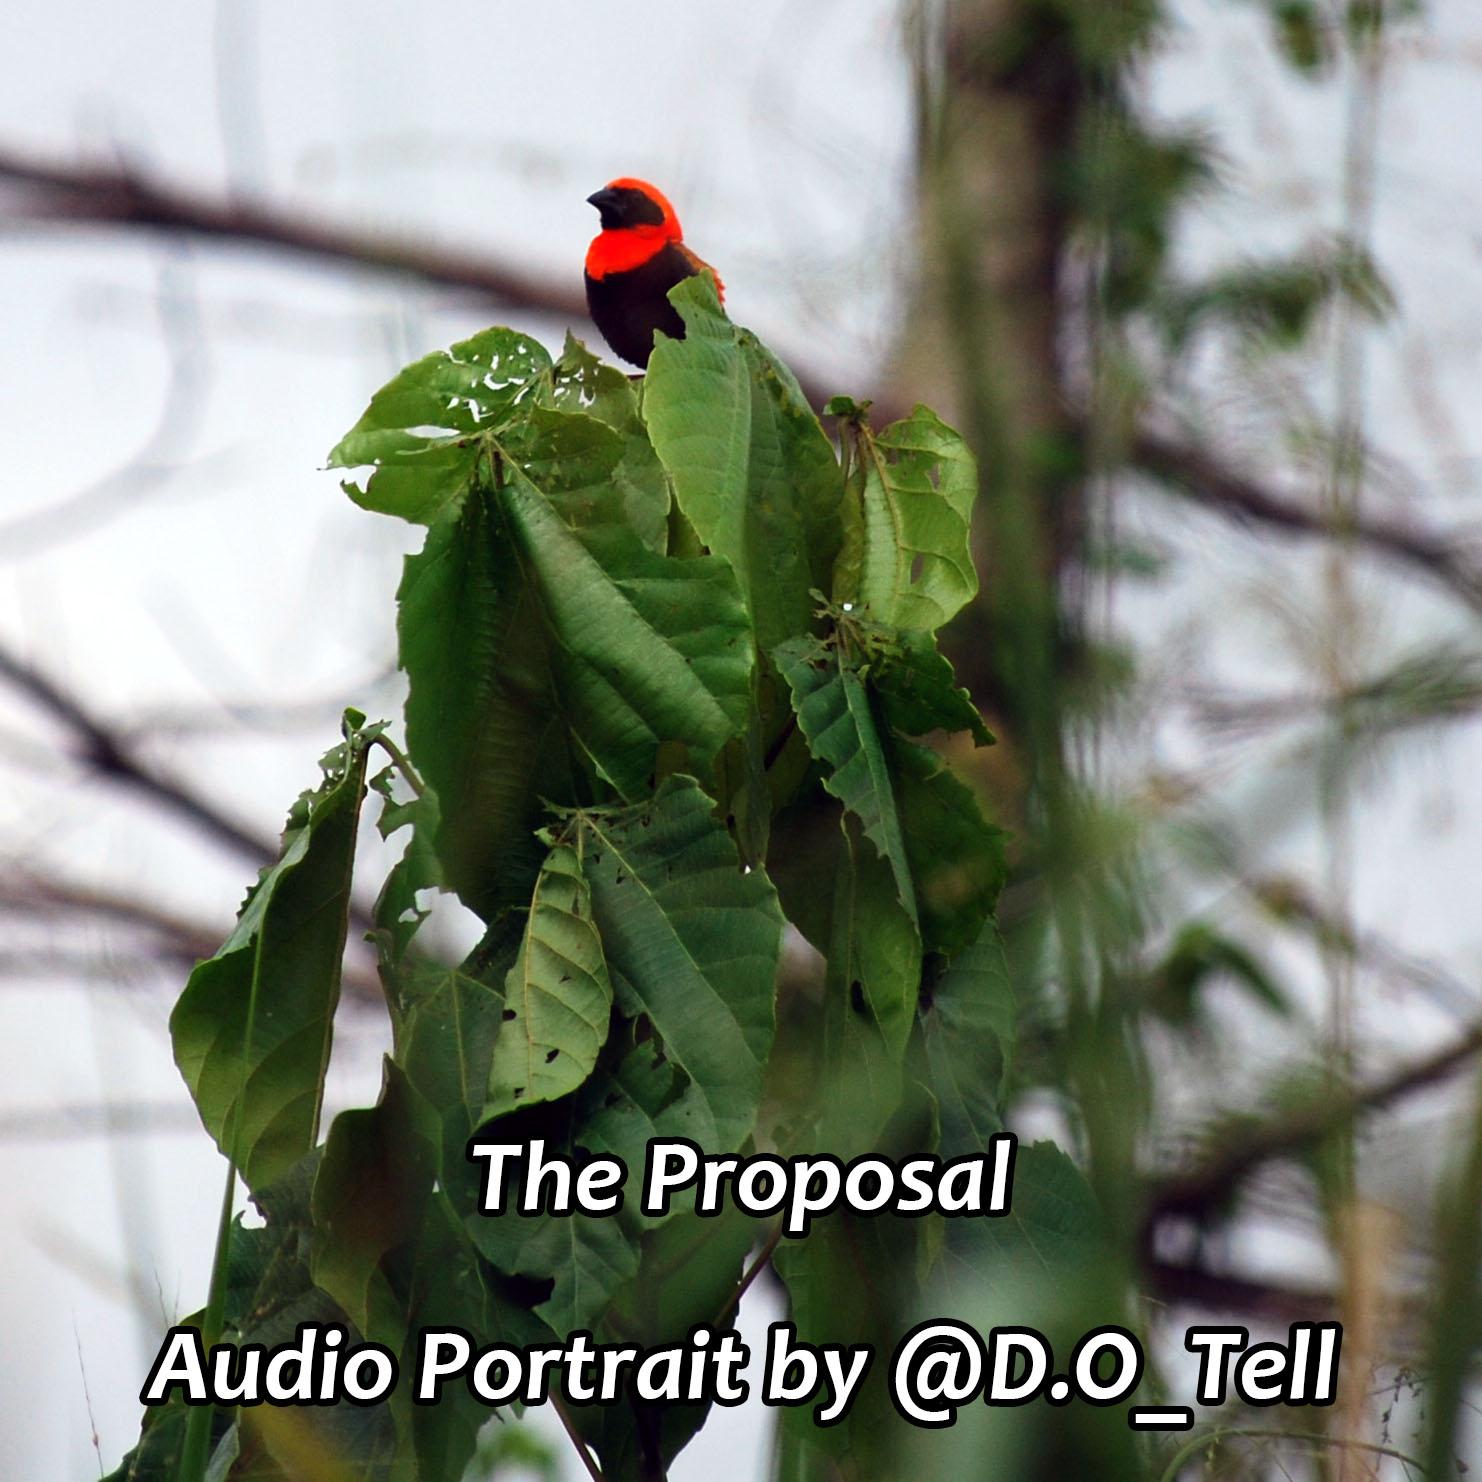 Caption: Red bird in Ghana, Credit: Megan Schuyler Kennedy